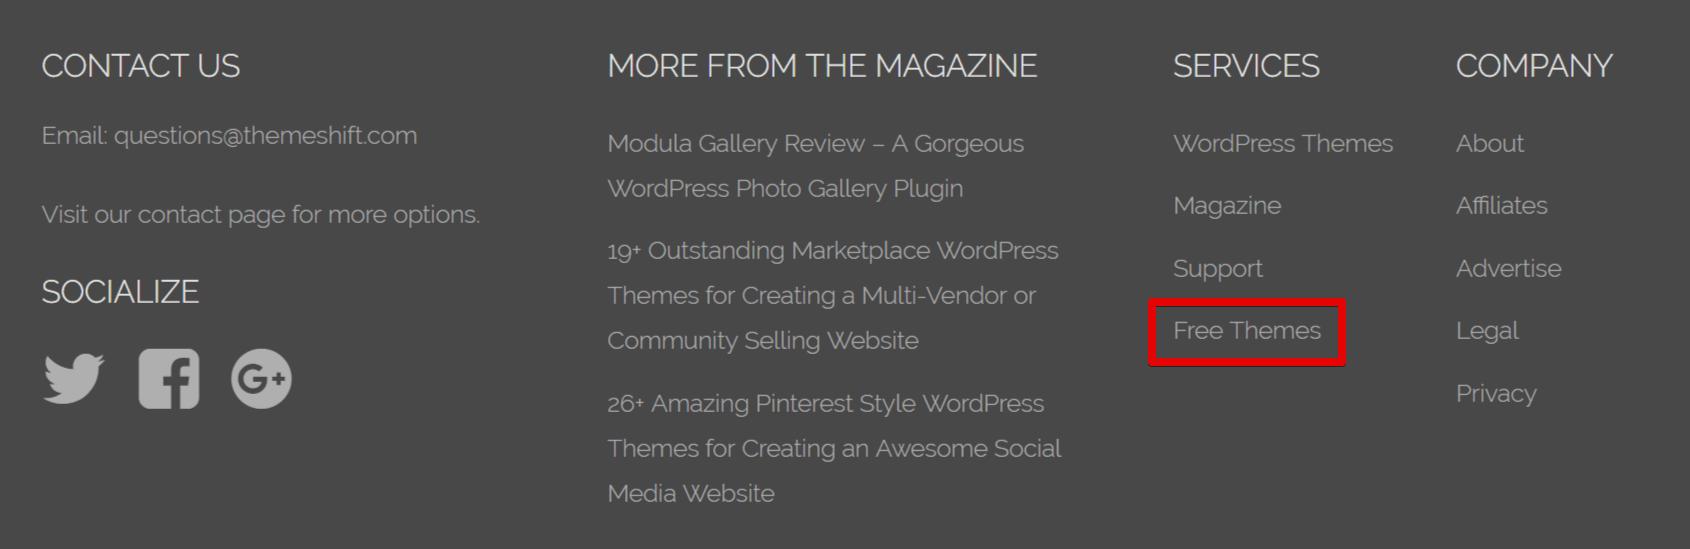 THEMESHIFT - WordPress Themes Vendor Review [HQ DESIGNS]-image2